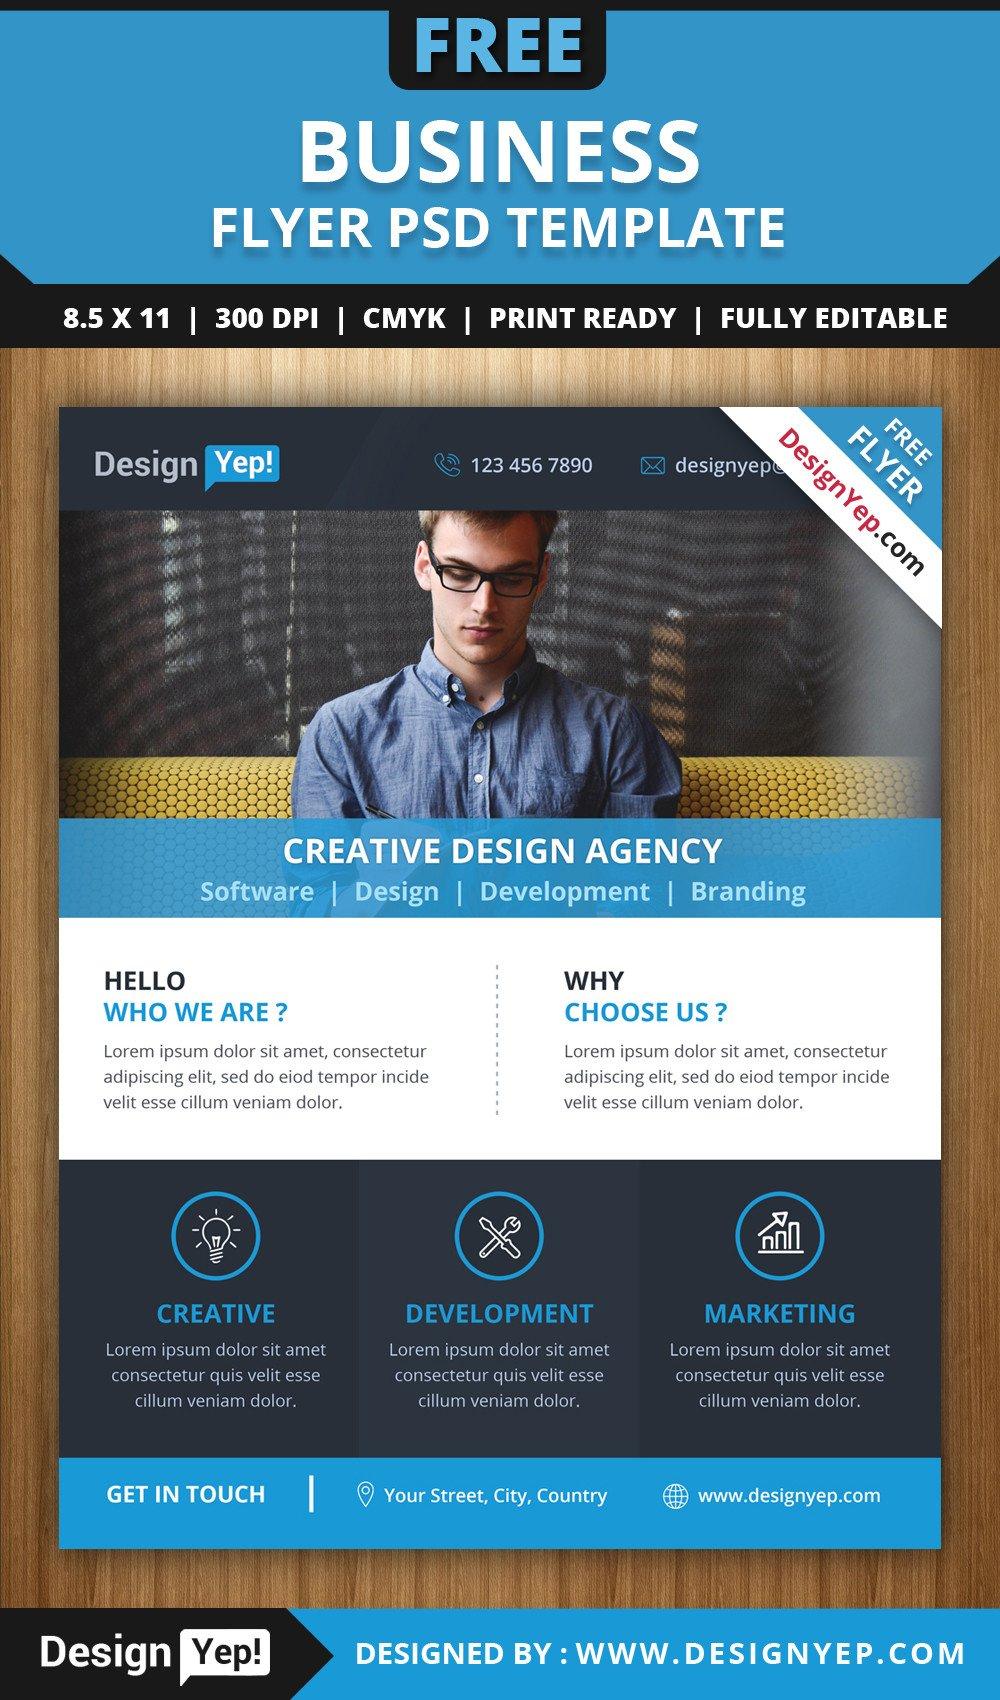 Free Download Business Flyer PSD Template DesignYep